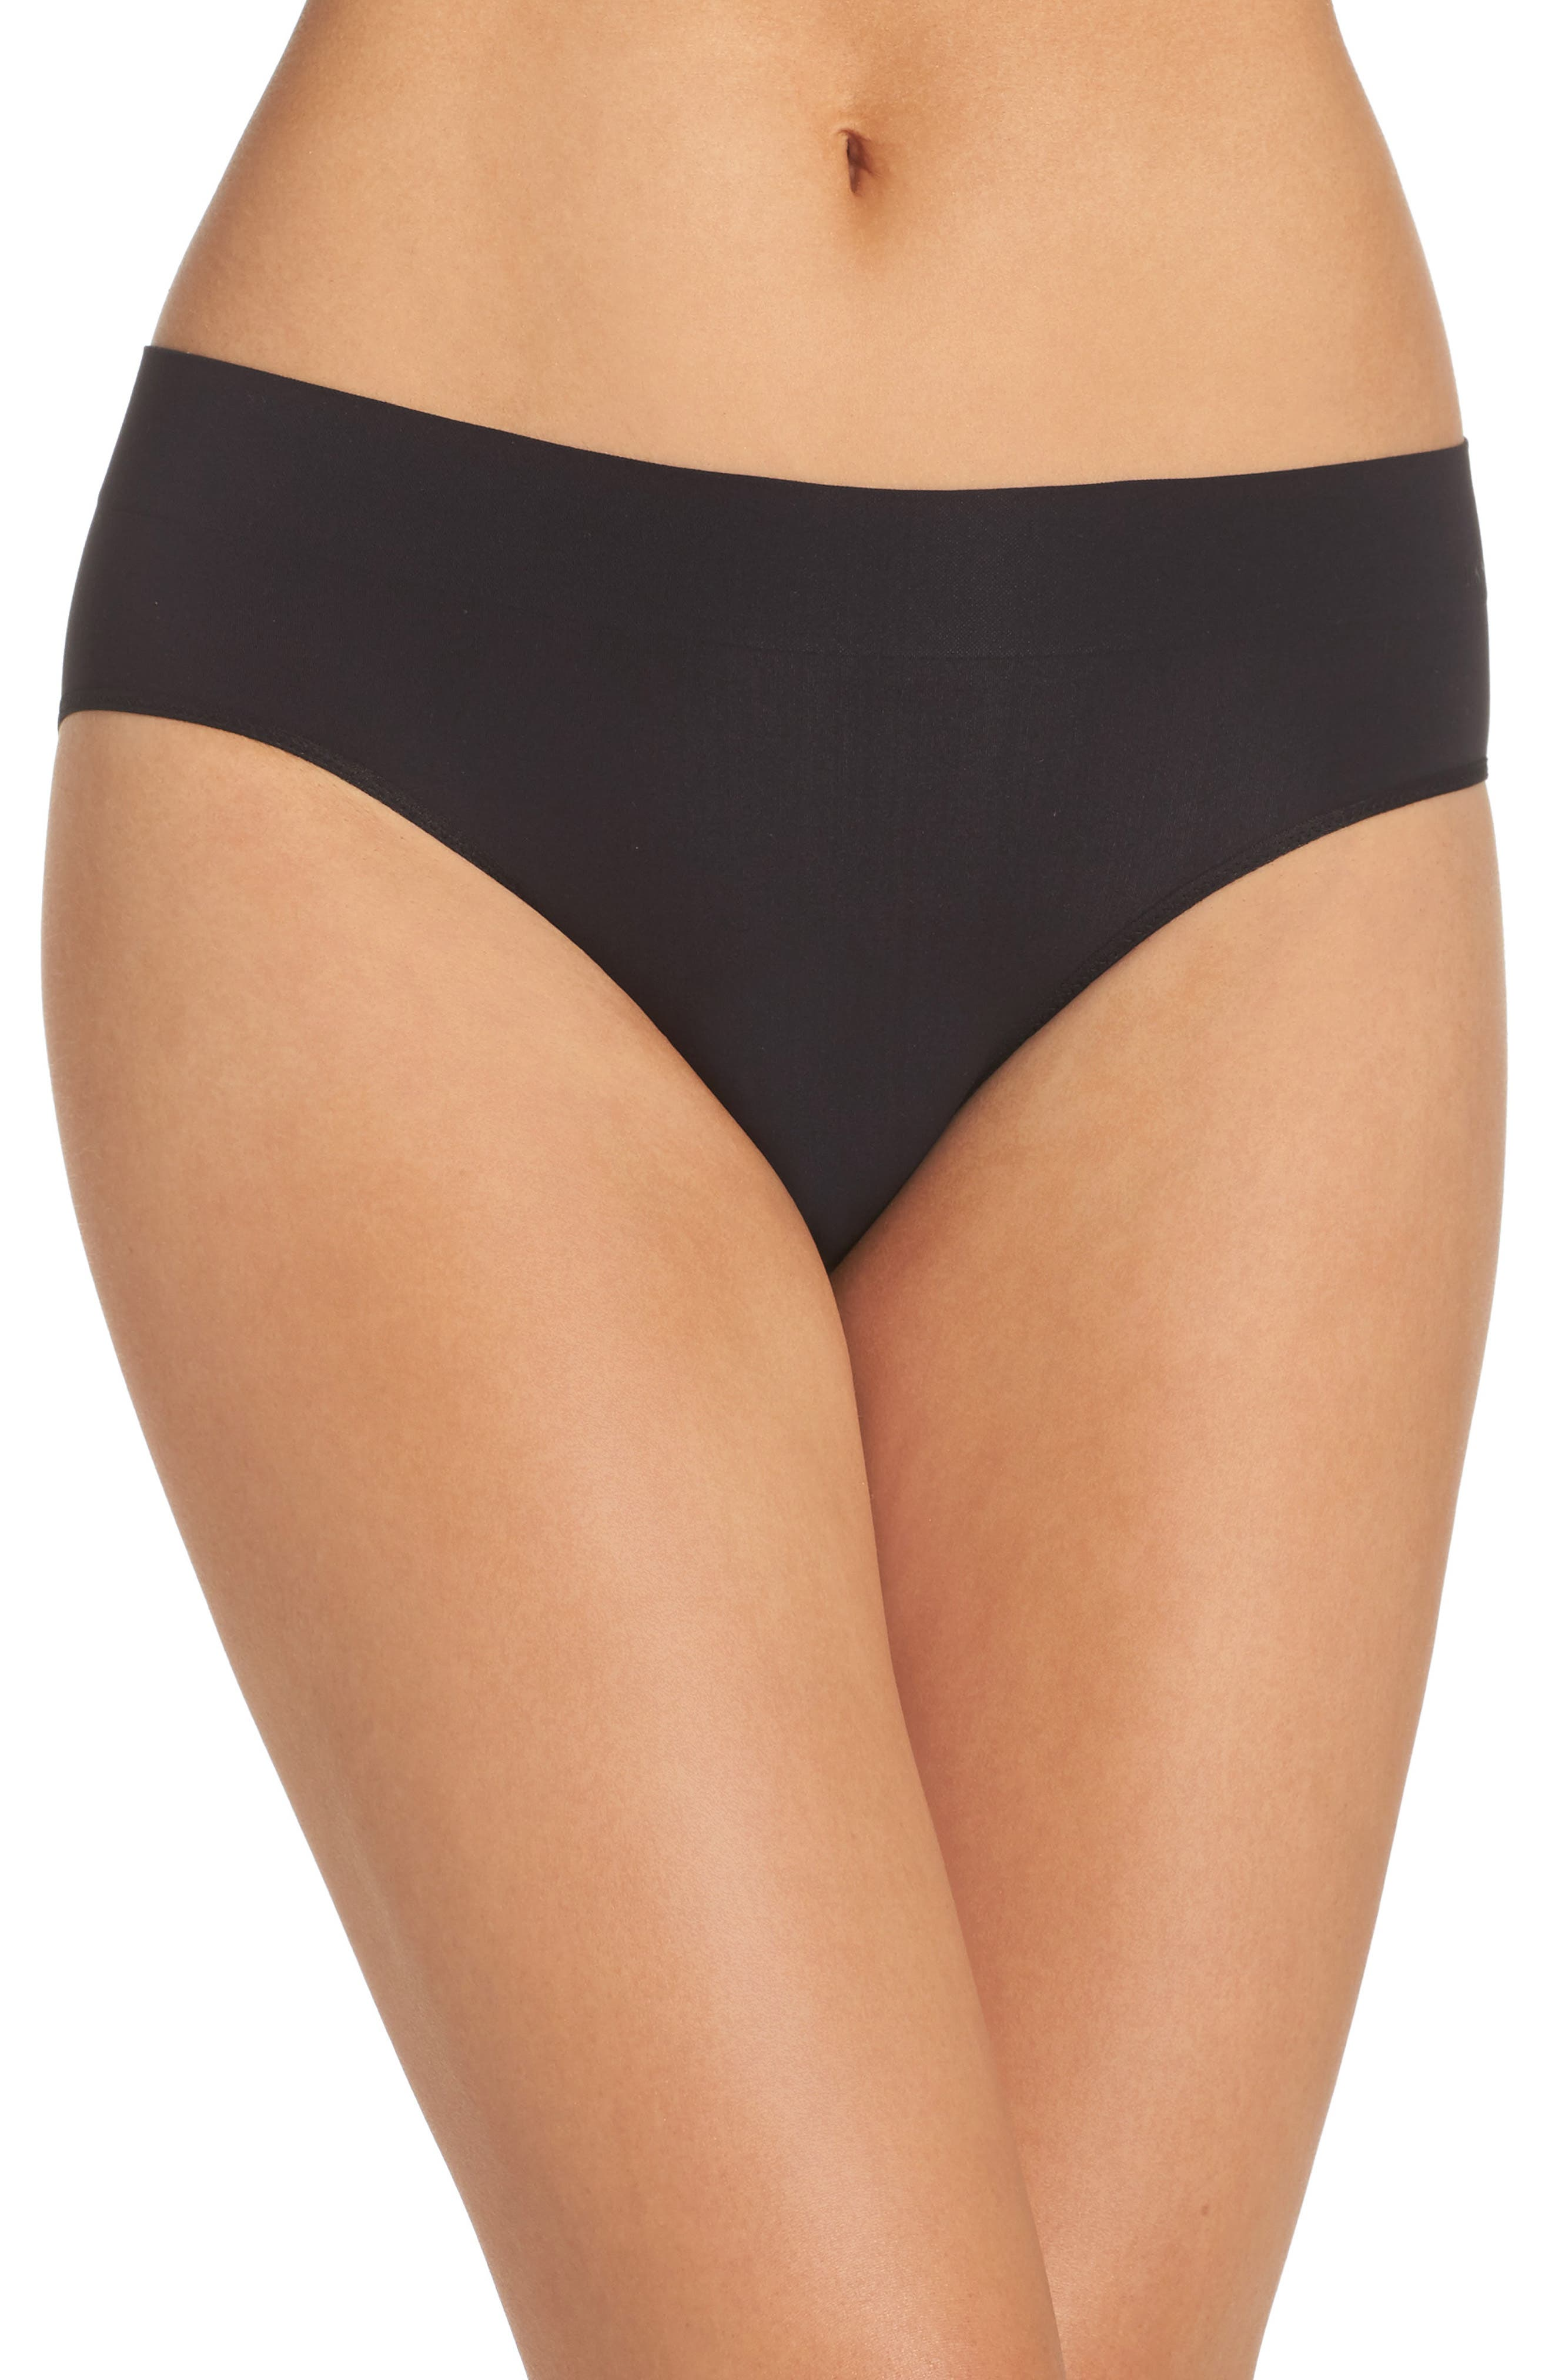 Alternate Image 1 Selected - DKNY LiteWear Seamless Bikini (3 for $33)